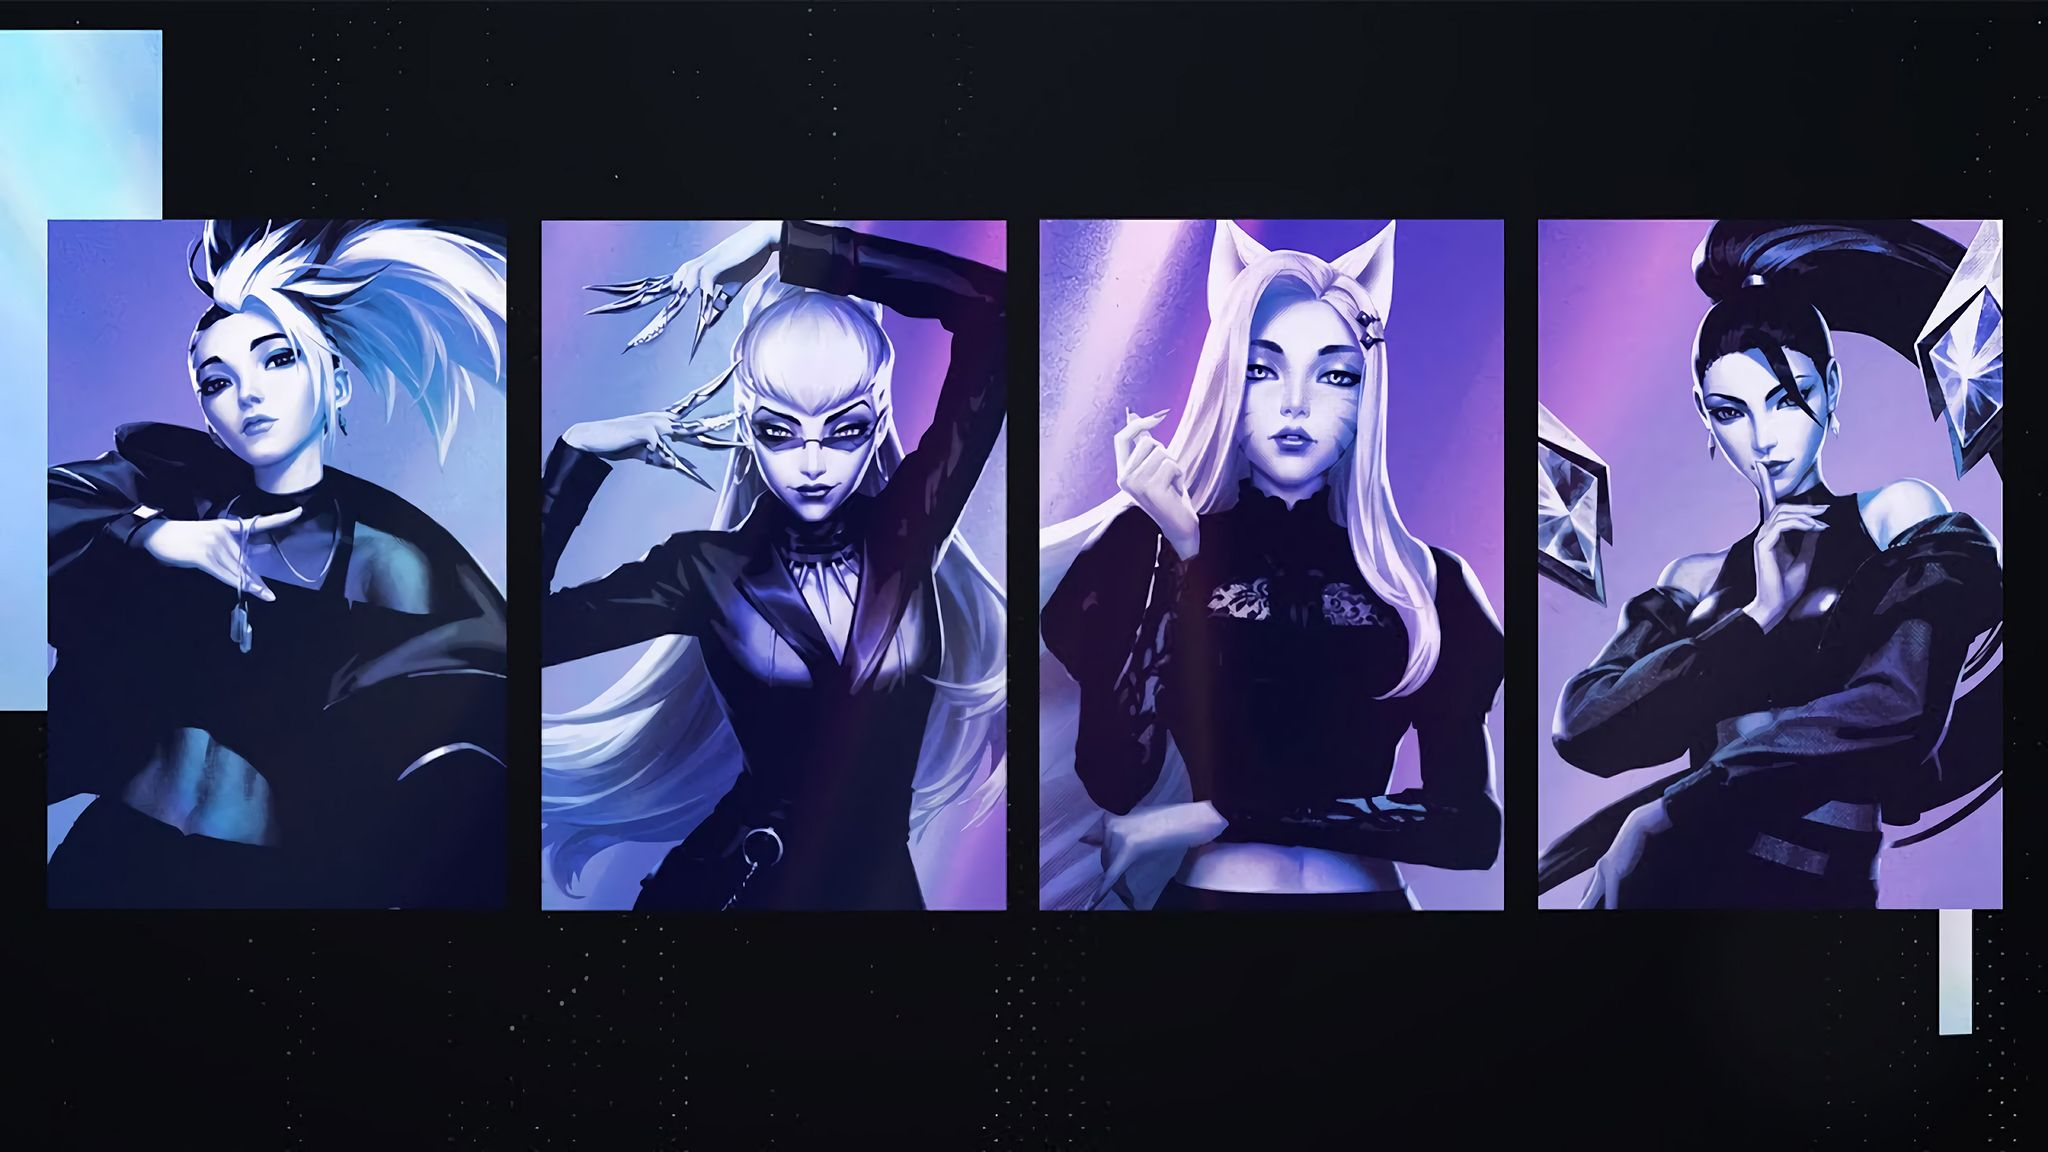 Desktop Wallpapers K Da The Baddest Ahri Evelynn Kai Sa Akali Artist Riot Games League Of Legends Waifu Clan Anime Pics Digital Art